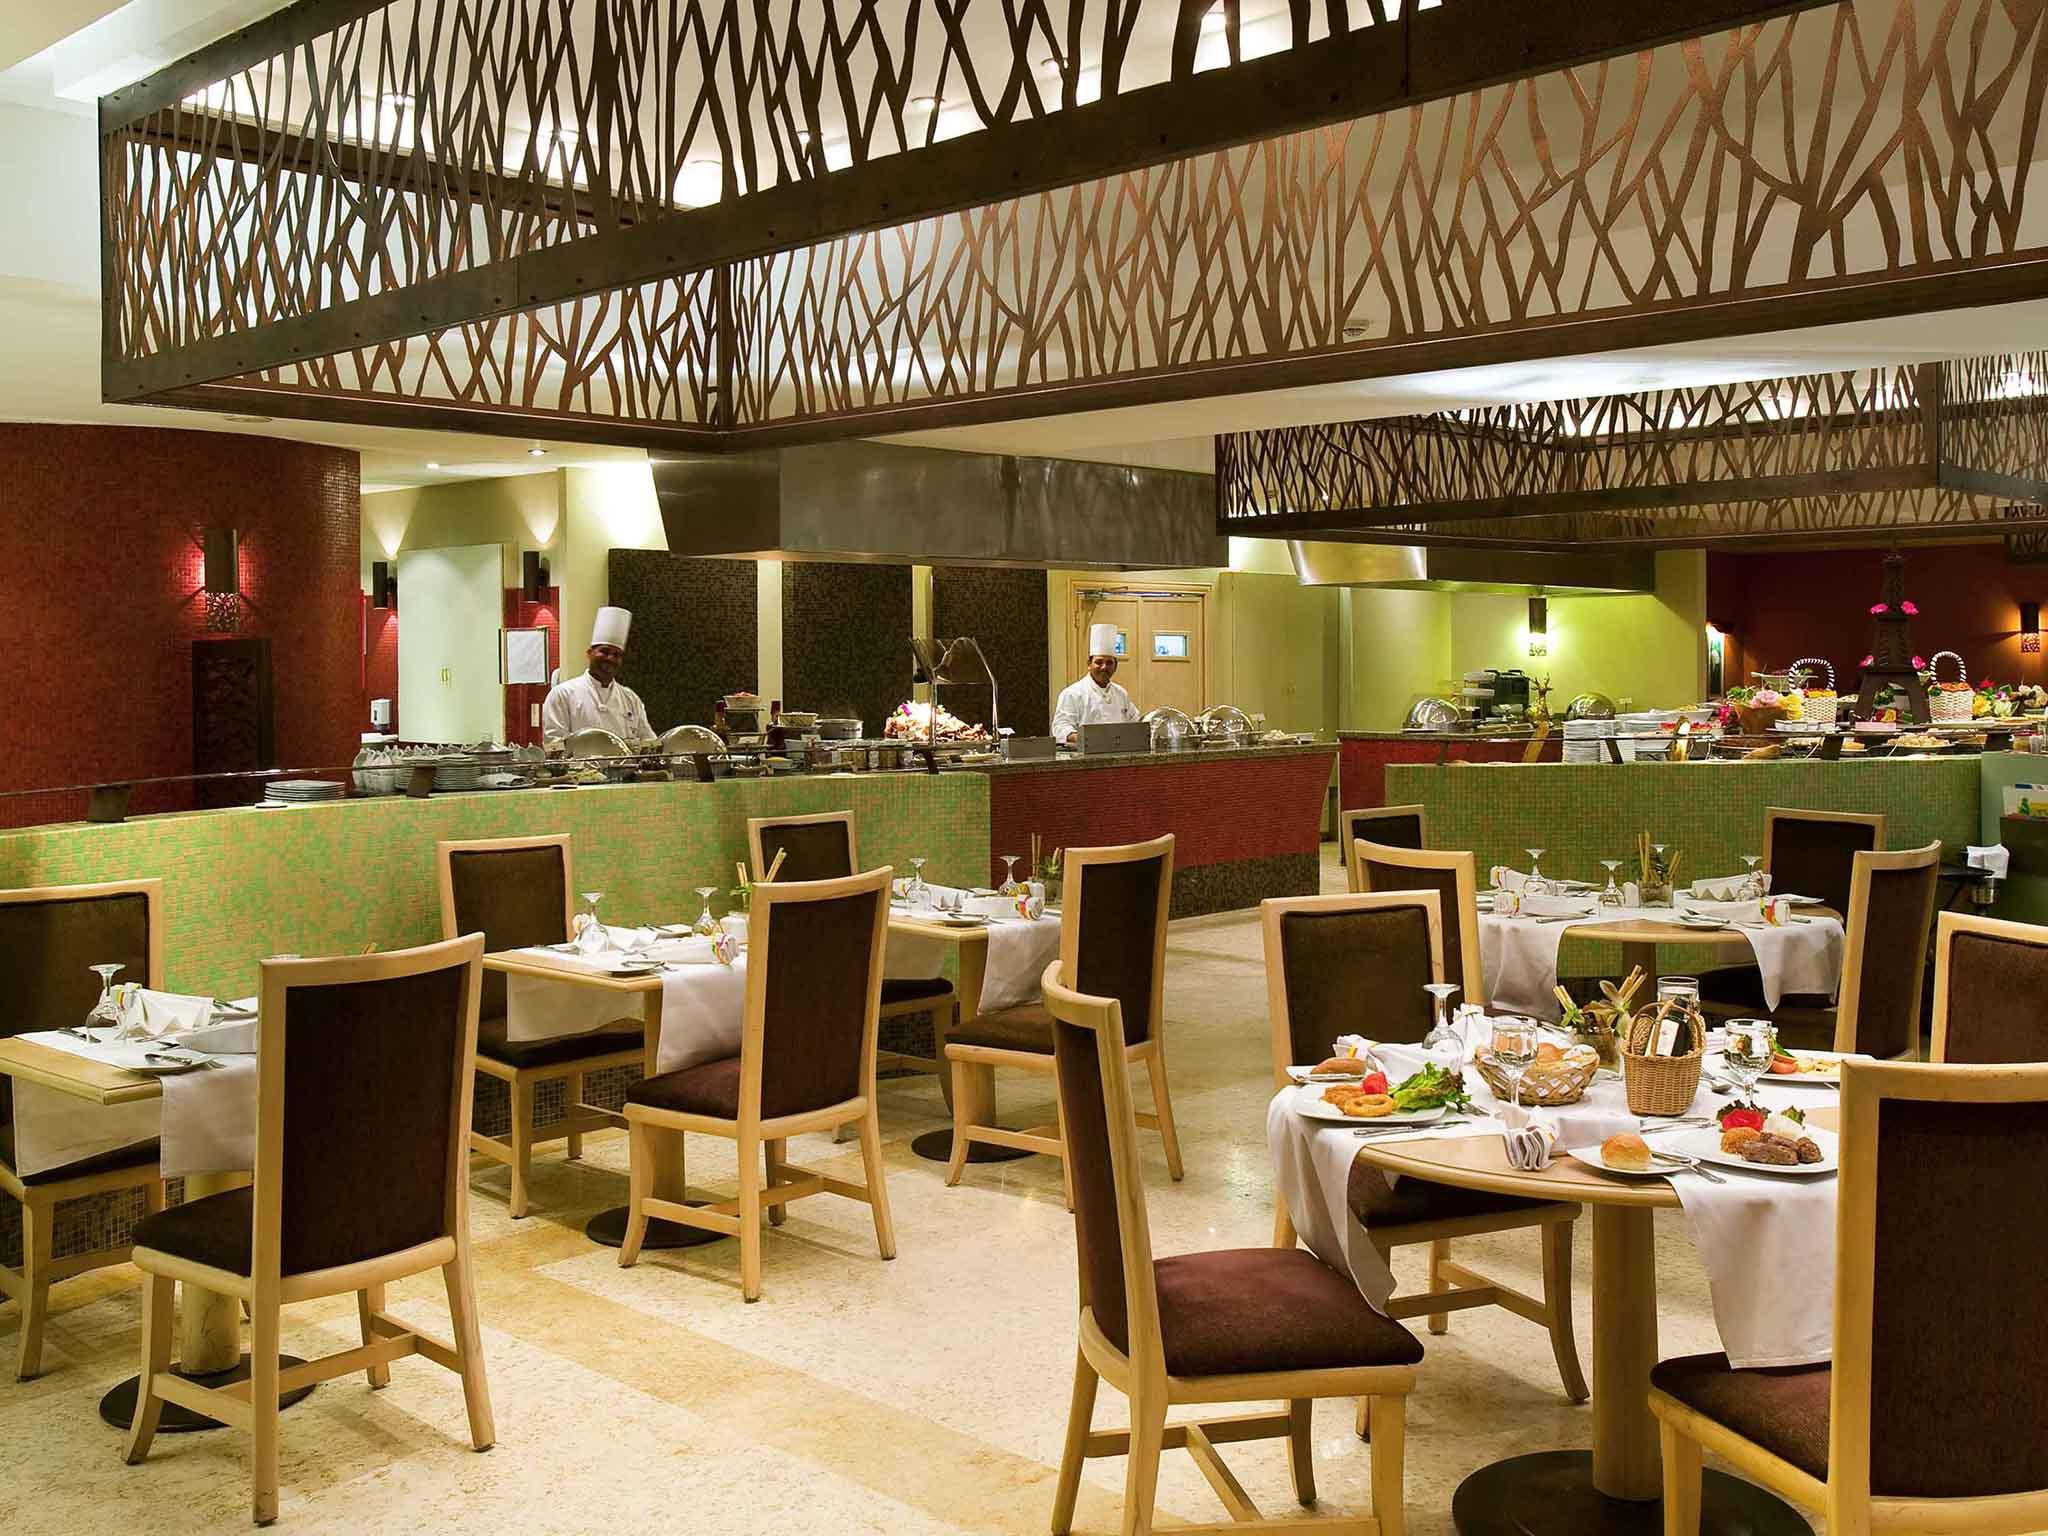 Hotel in CAIRO - Novotel Cairo Airport